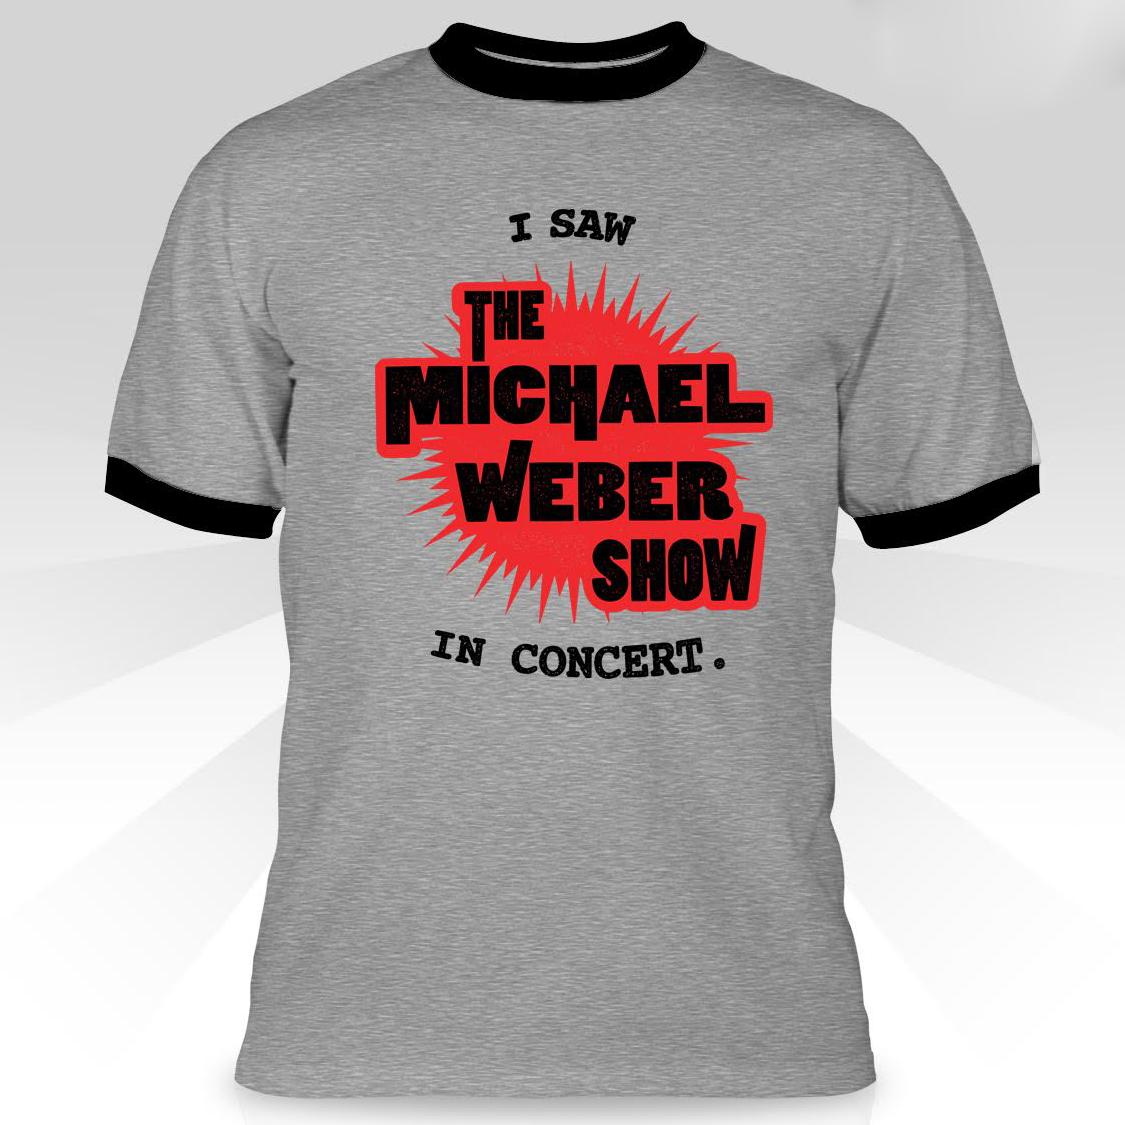 T-Shirt (Grey/Black Ringer)